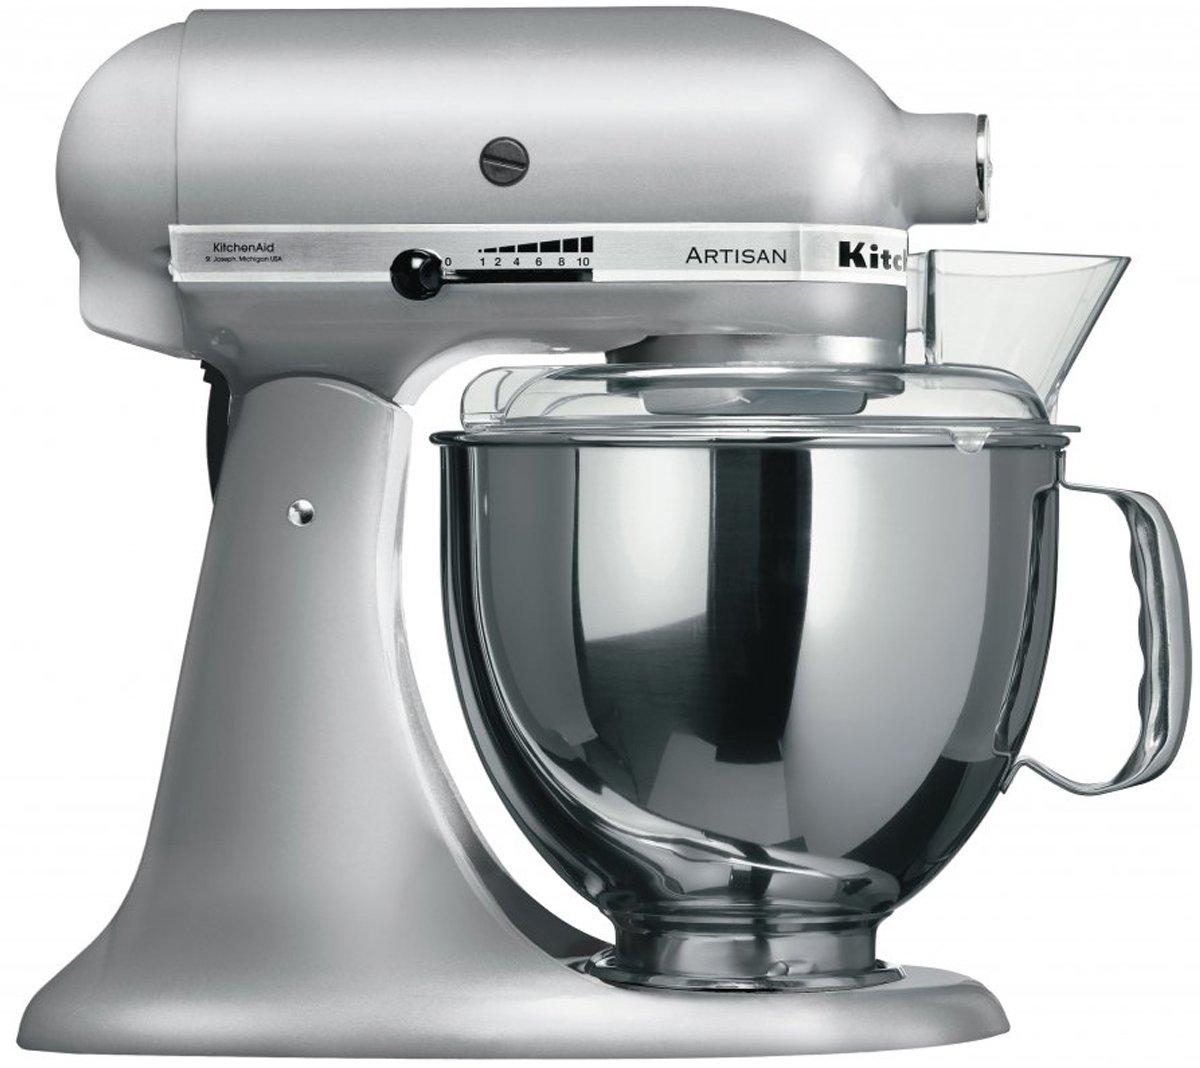 Kitchenaid Ksm150psmc Artisan 5 Quart Stand Mixer.Kitchenaid Artisan ...